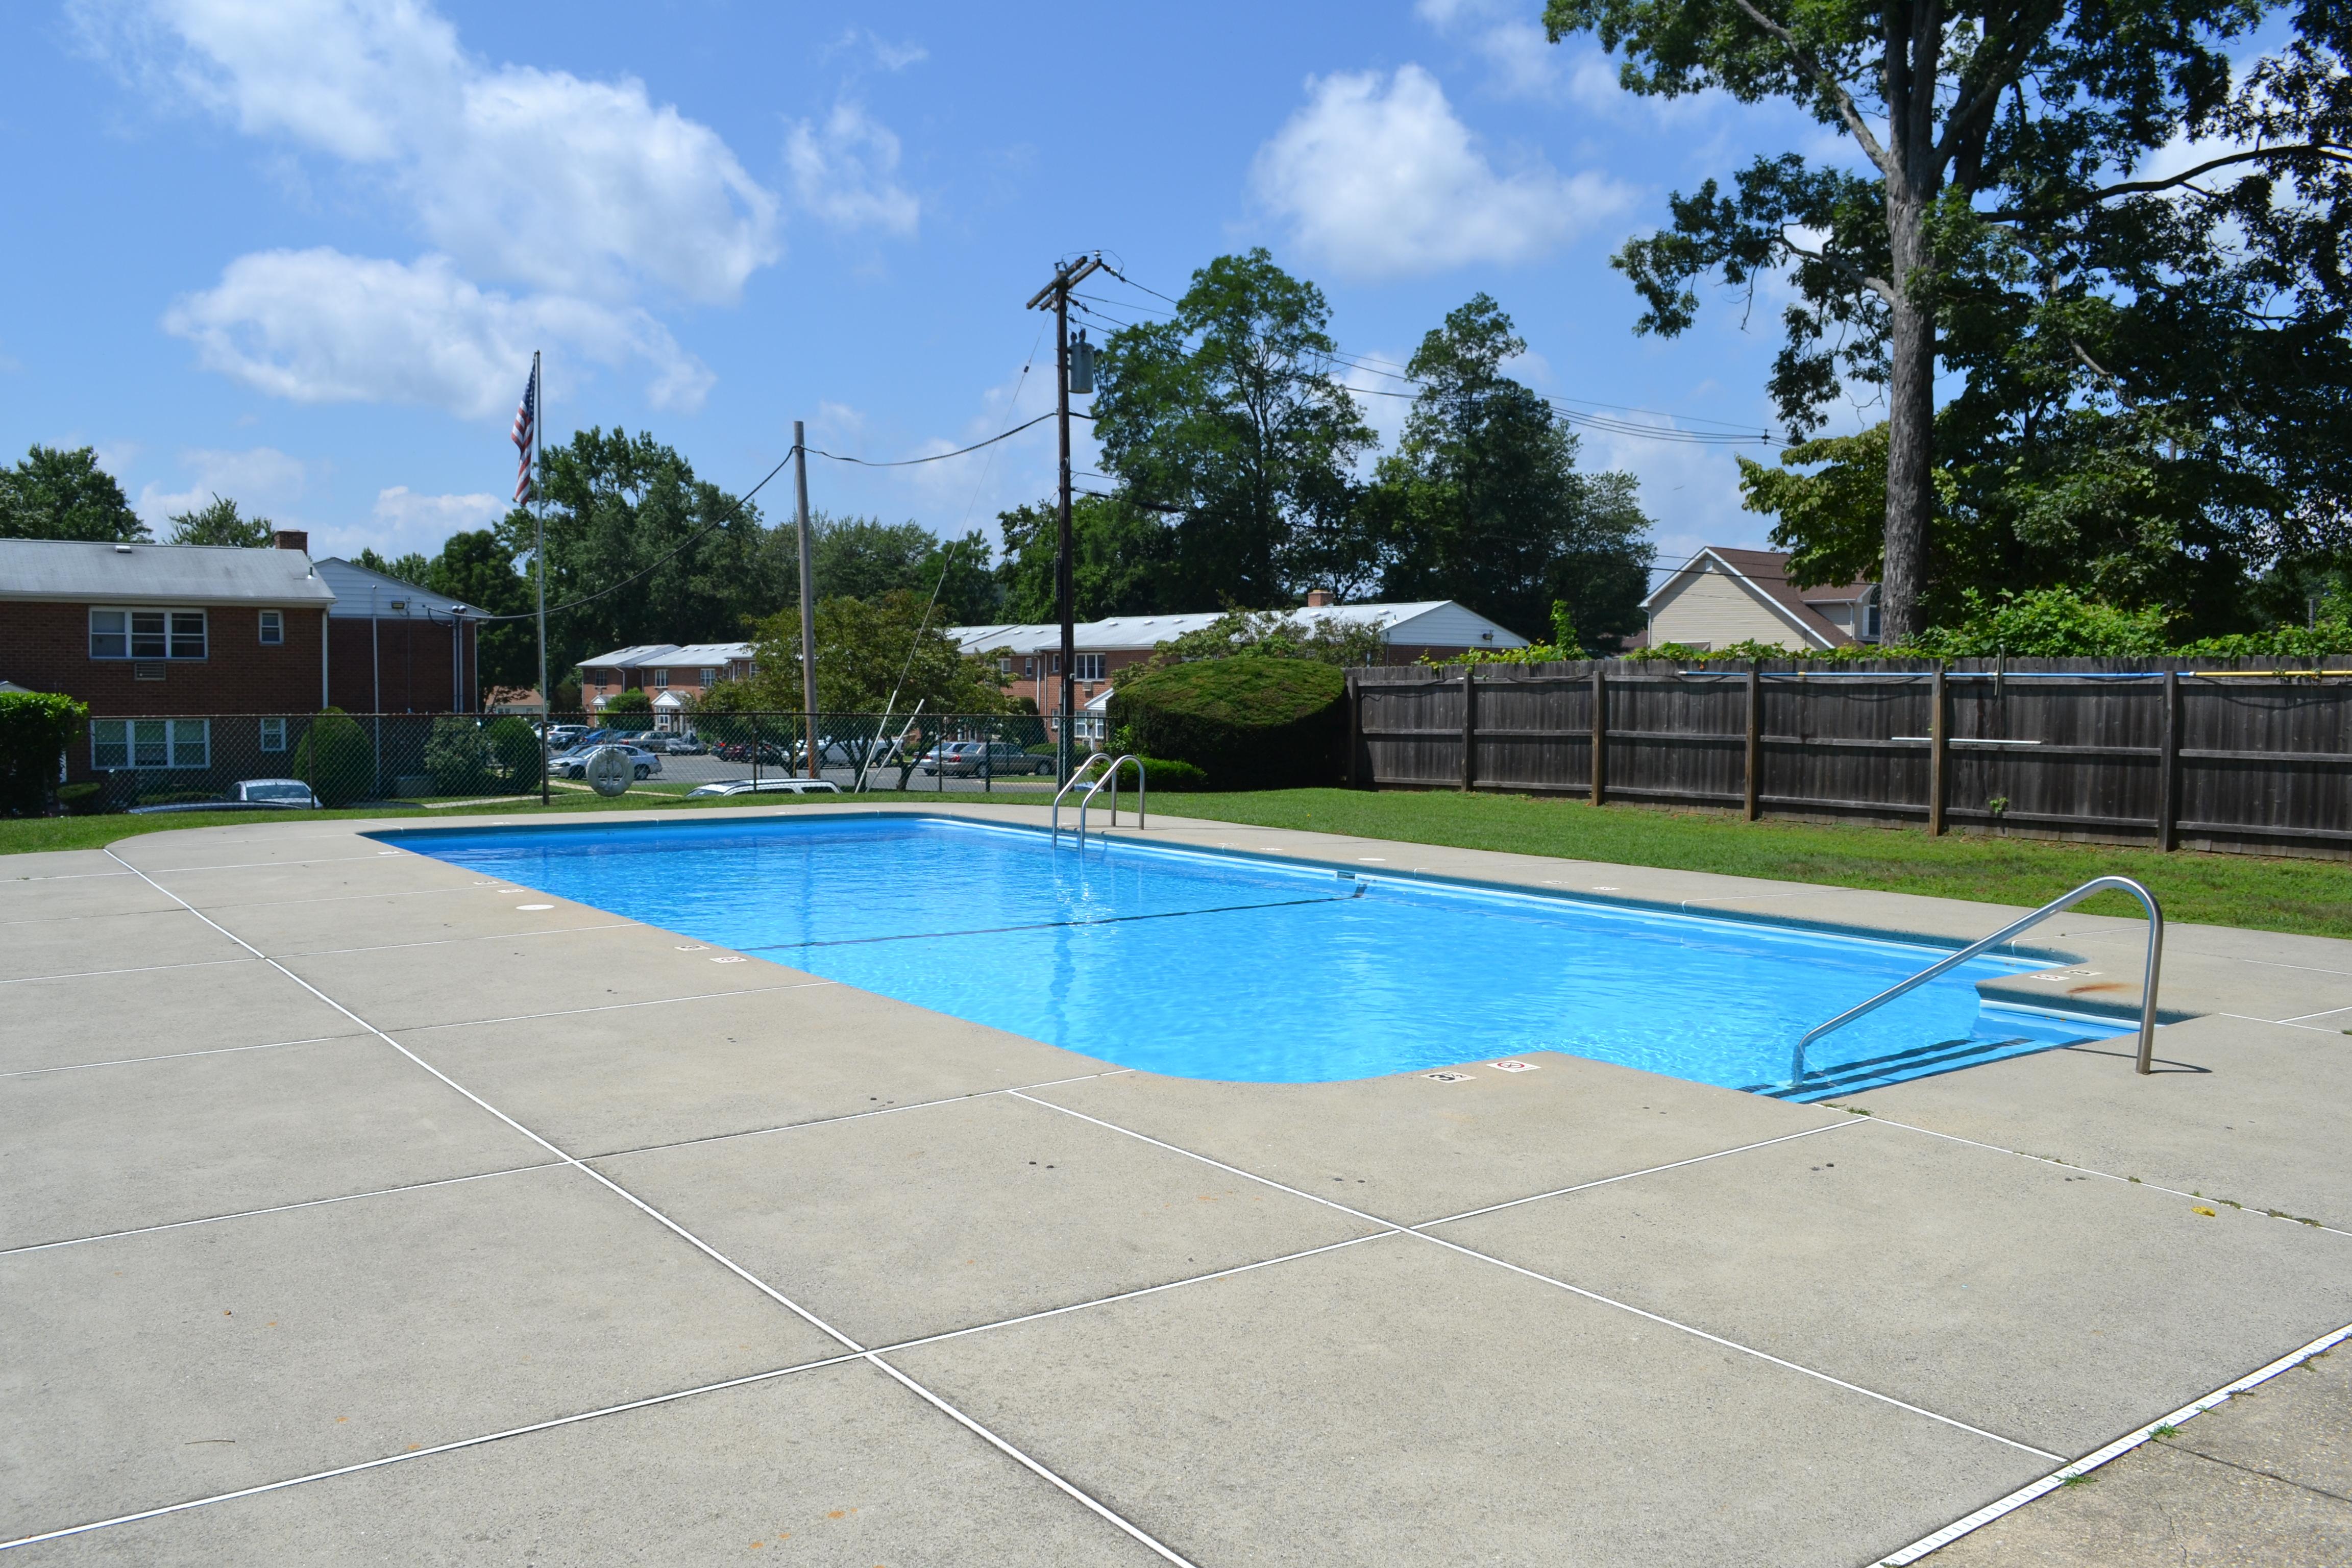 King James Condos Pool Atlantic Highlands NJ 07716